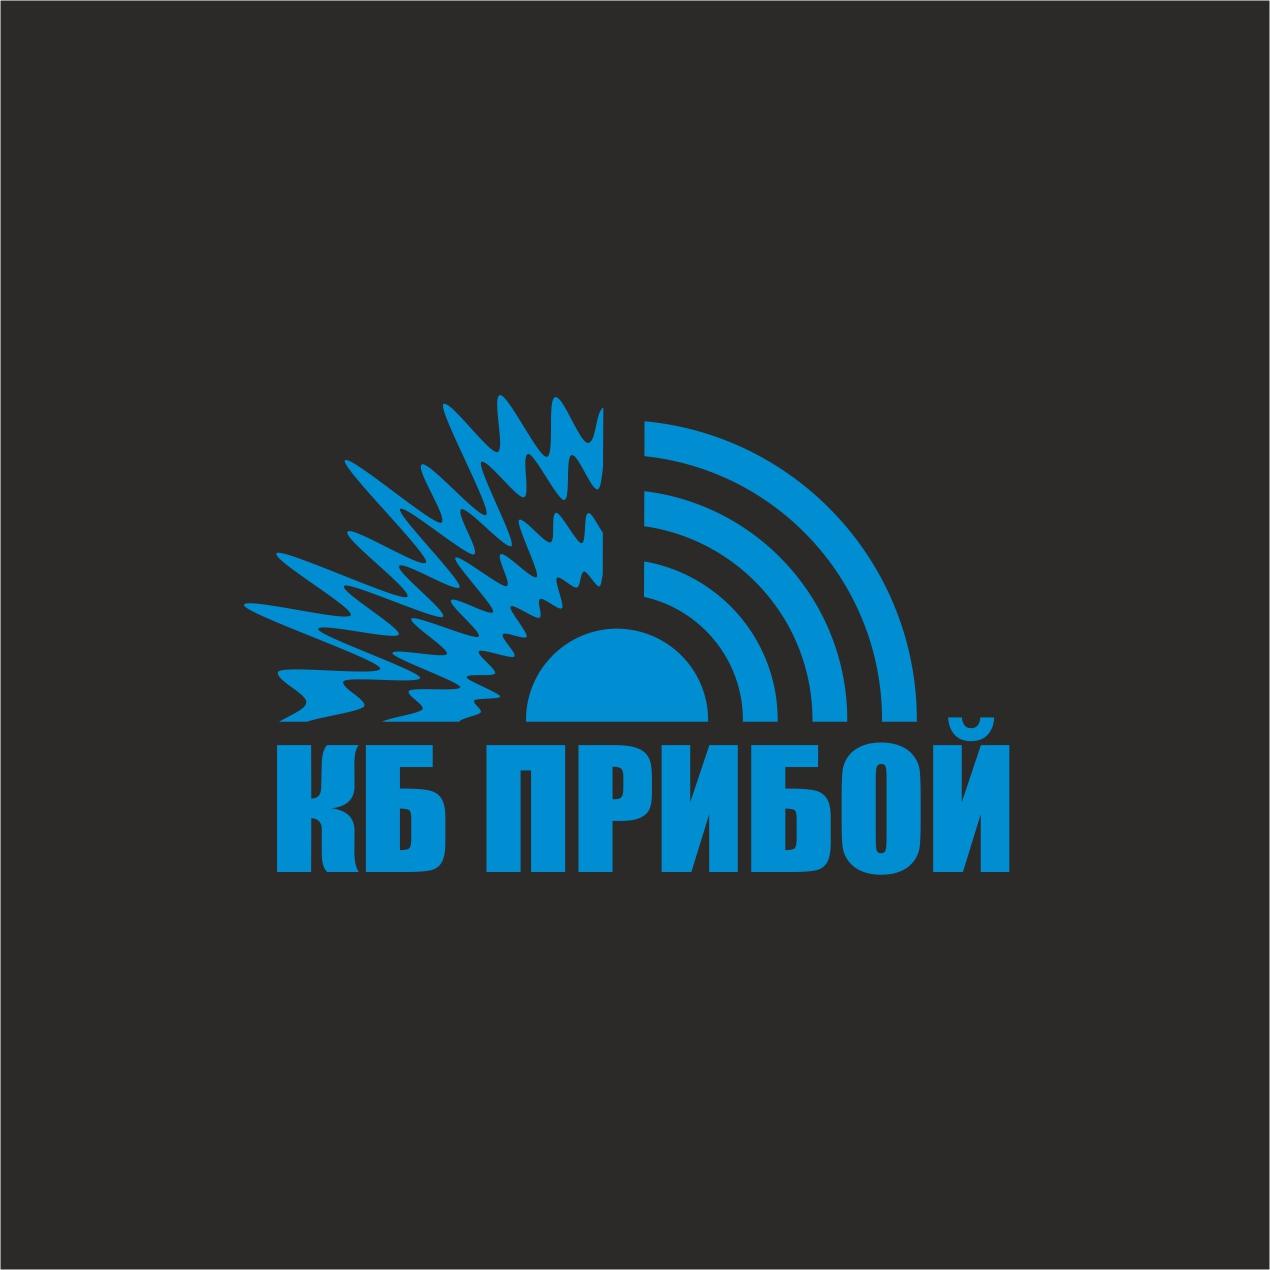 Разработка логотипа и фирменного стиля для КБ Прибой фото f_4905b24067d82f81.jpg